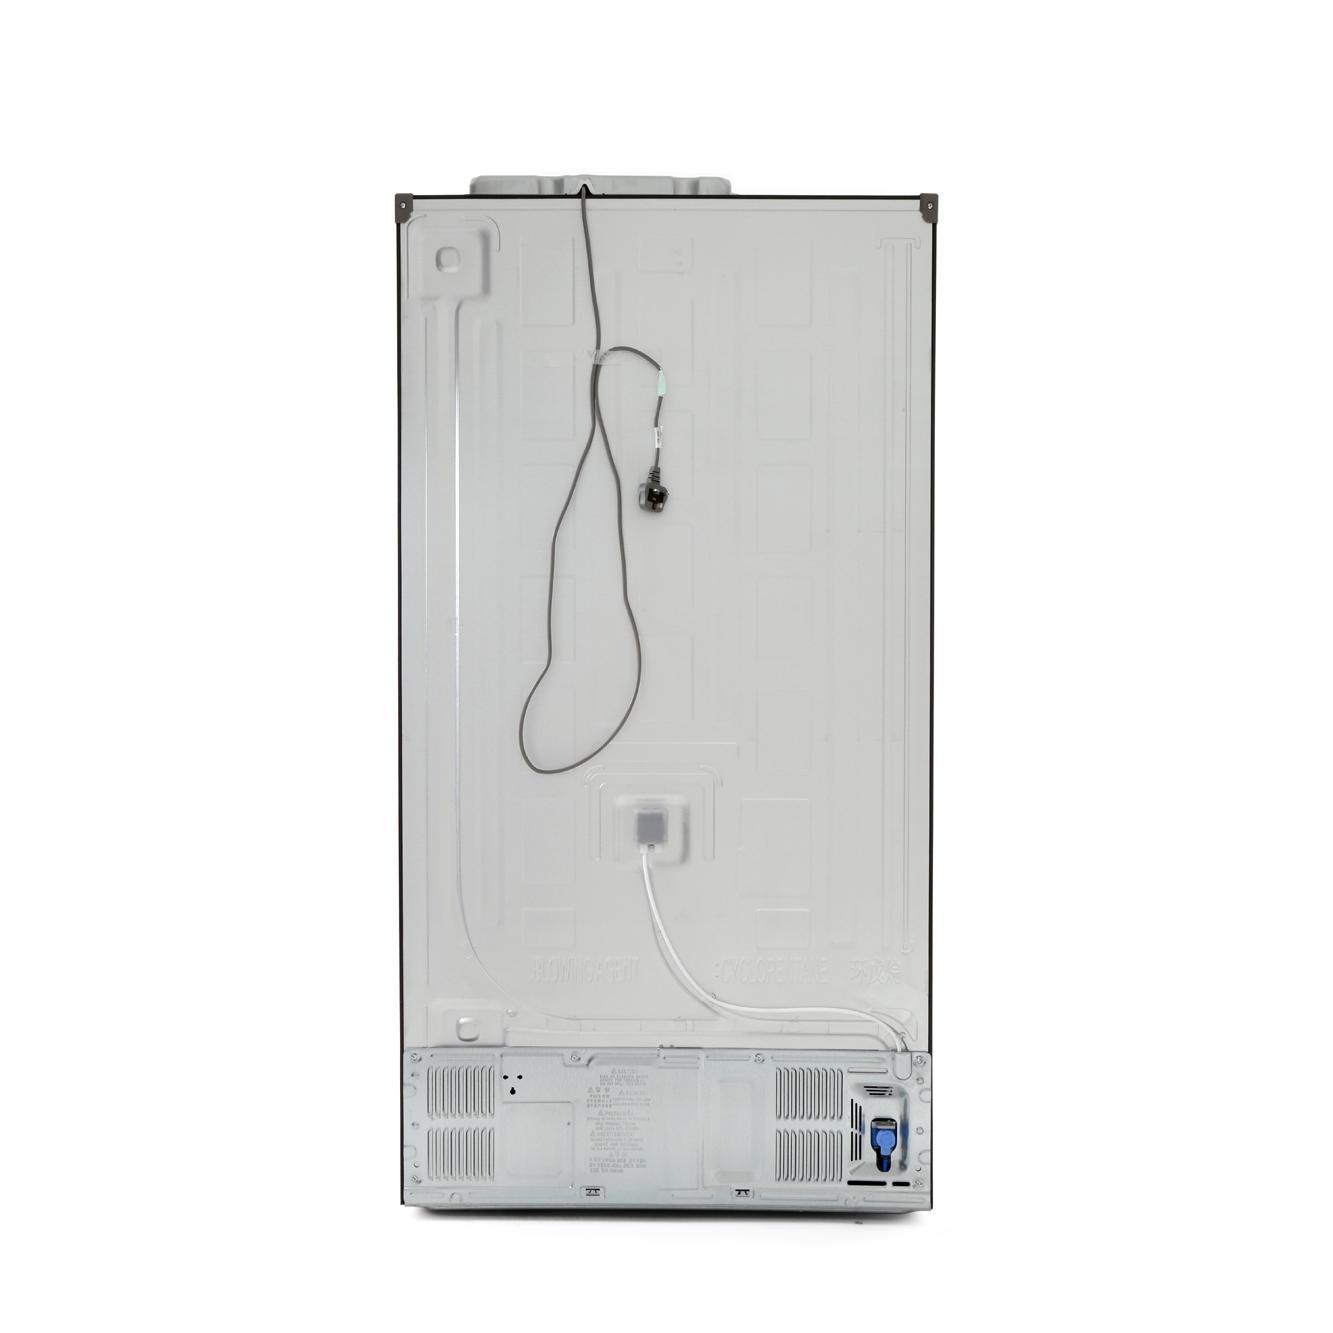 Buy LG GSL761WBXV American Fridge Freezer - Black | Marks